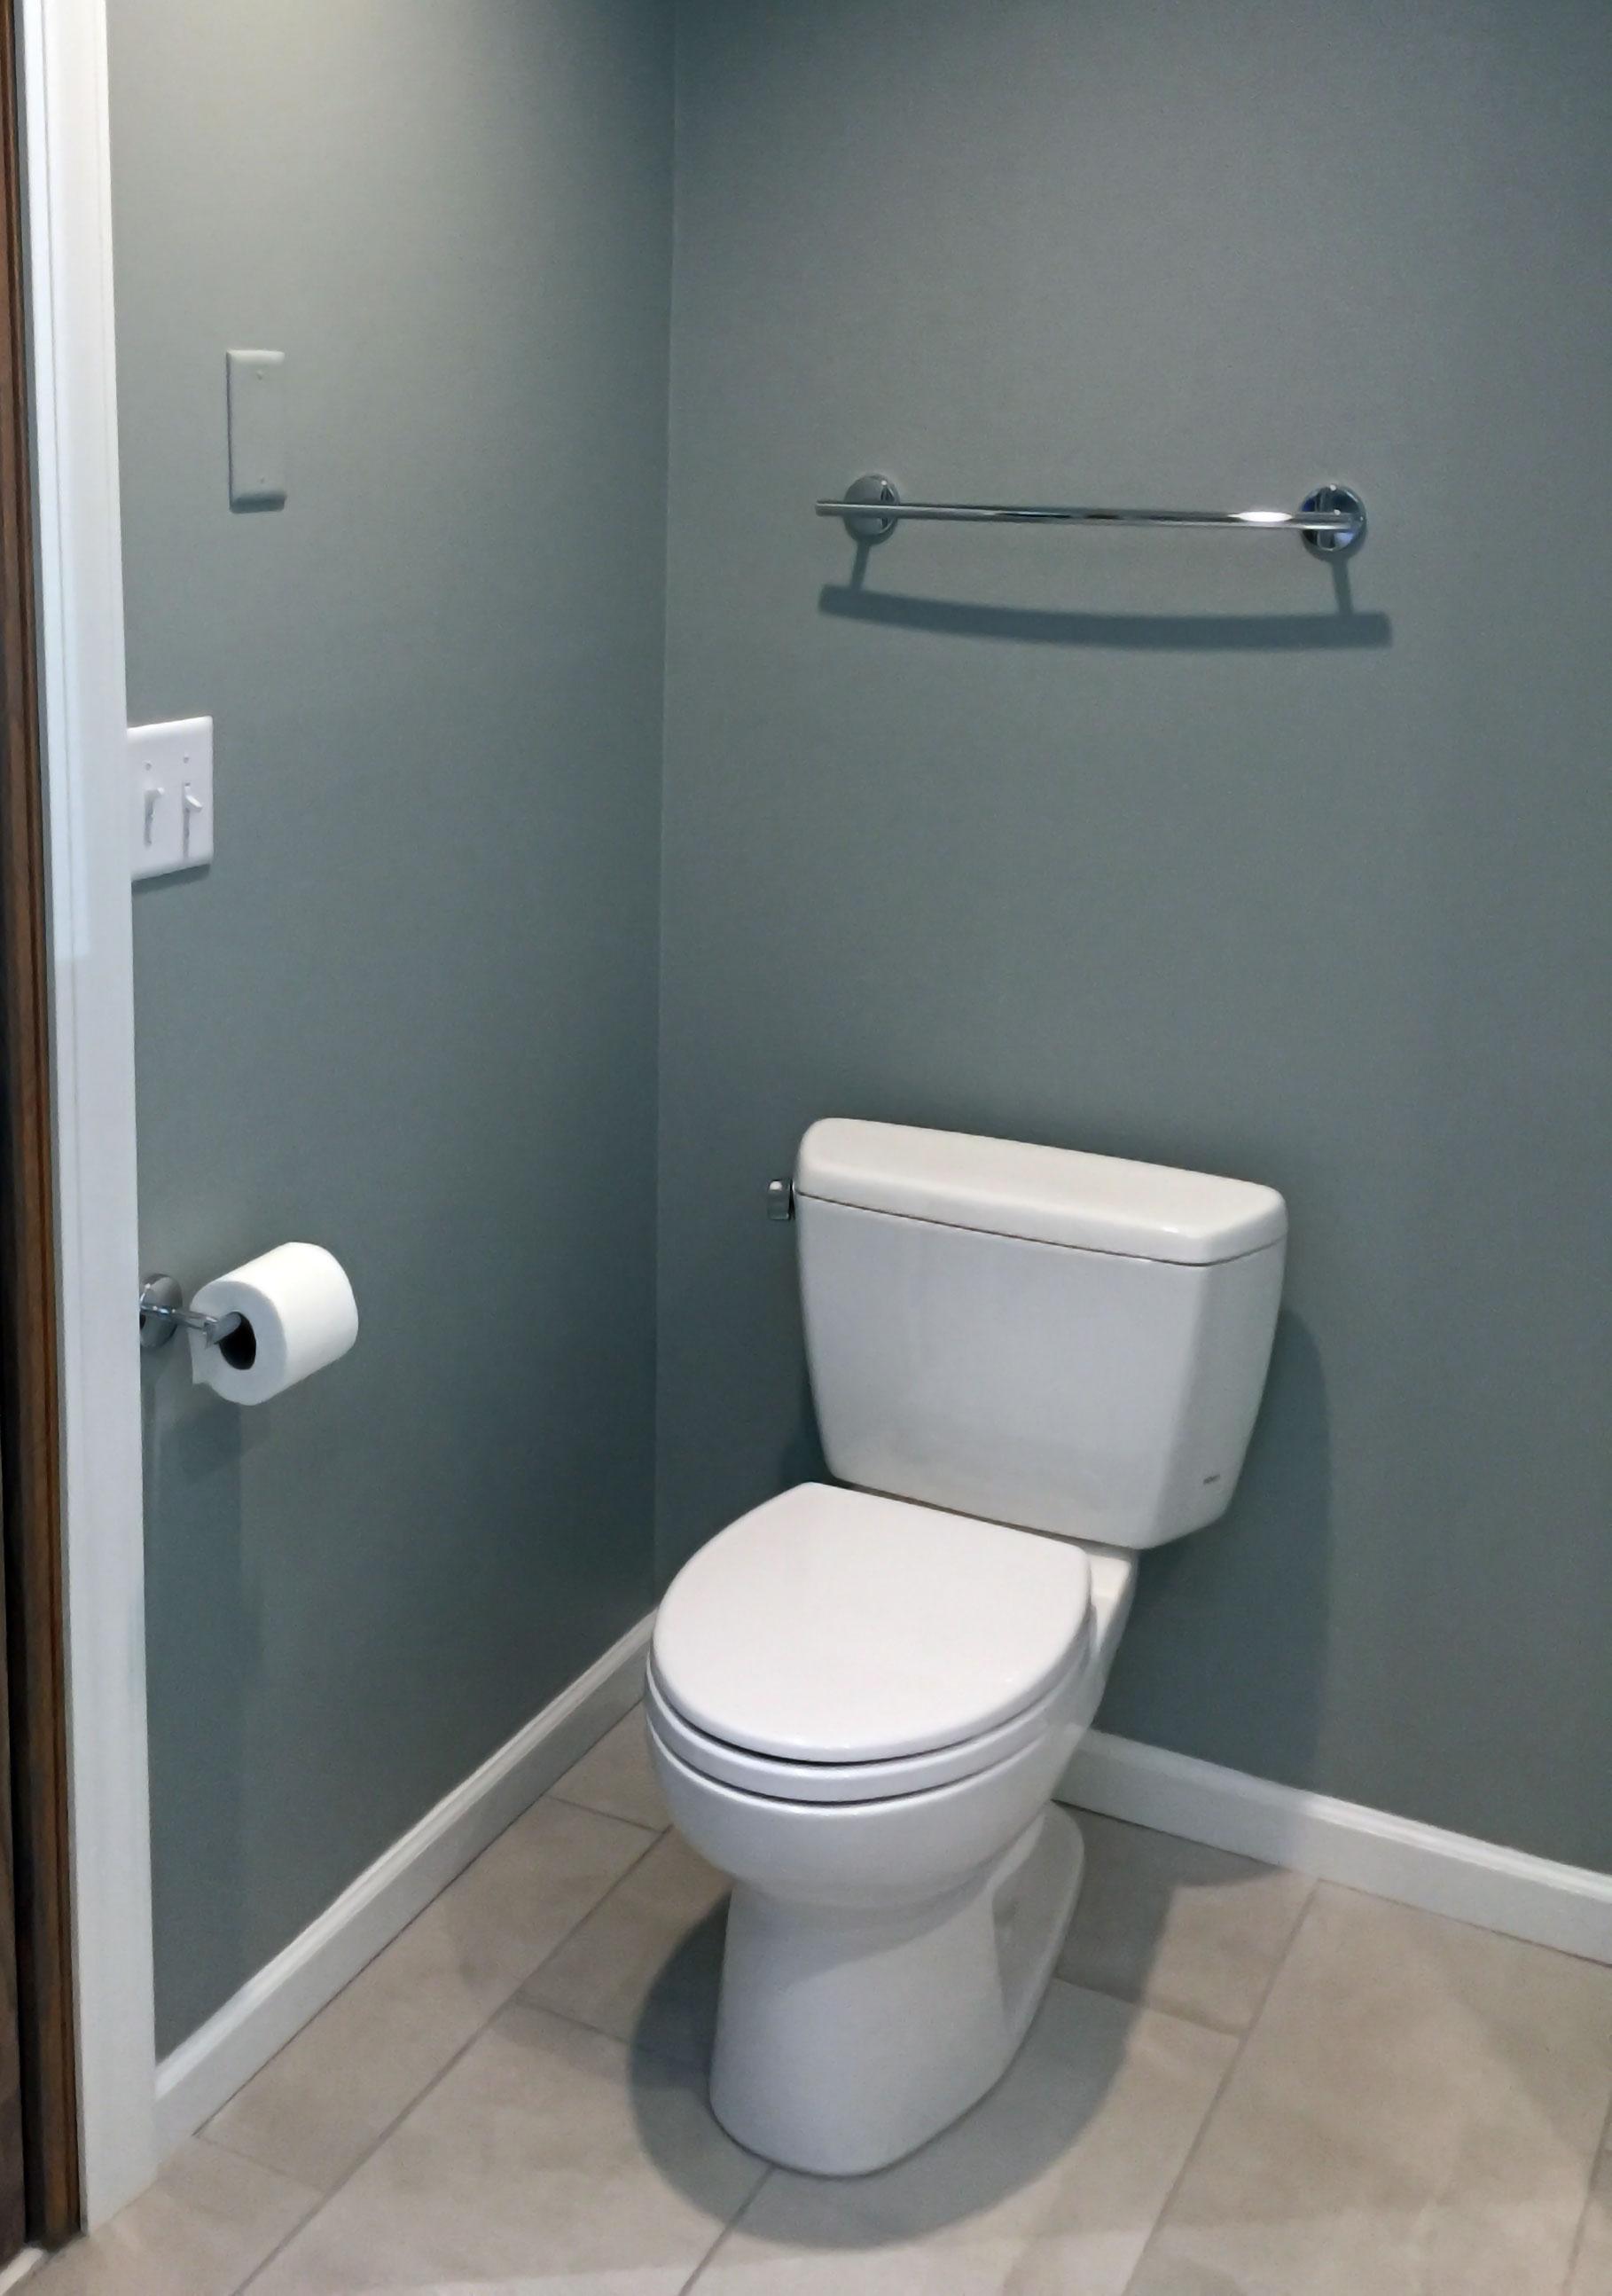 New plumbing and toilet